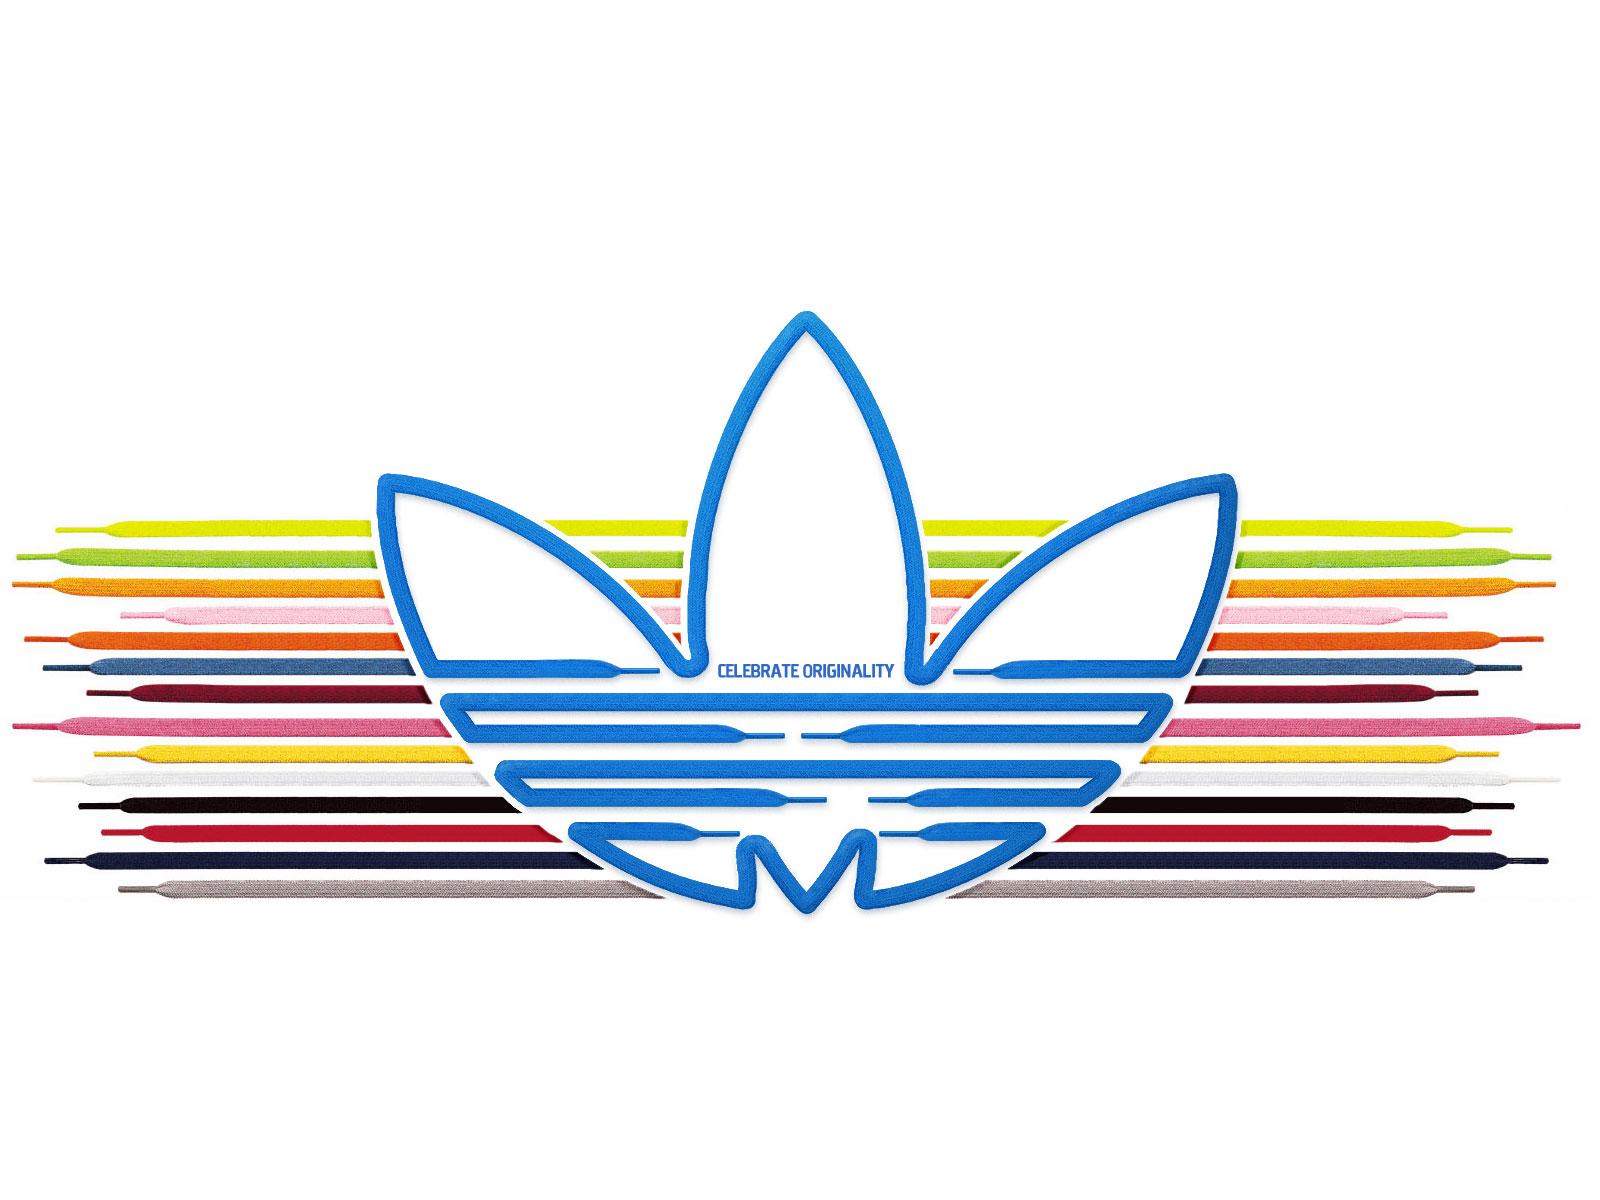 Celebrate Originality - adidas wallpaper